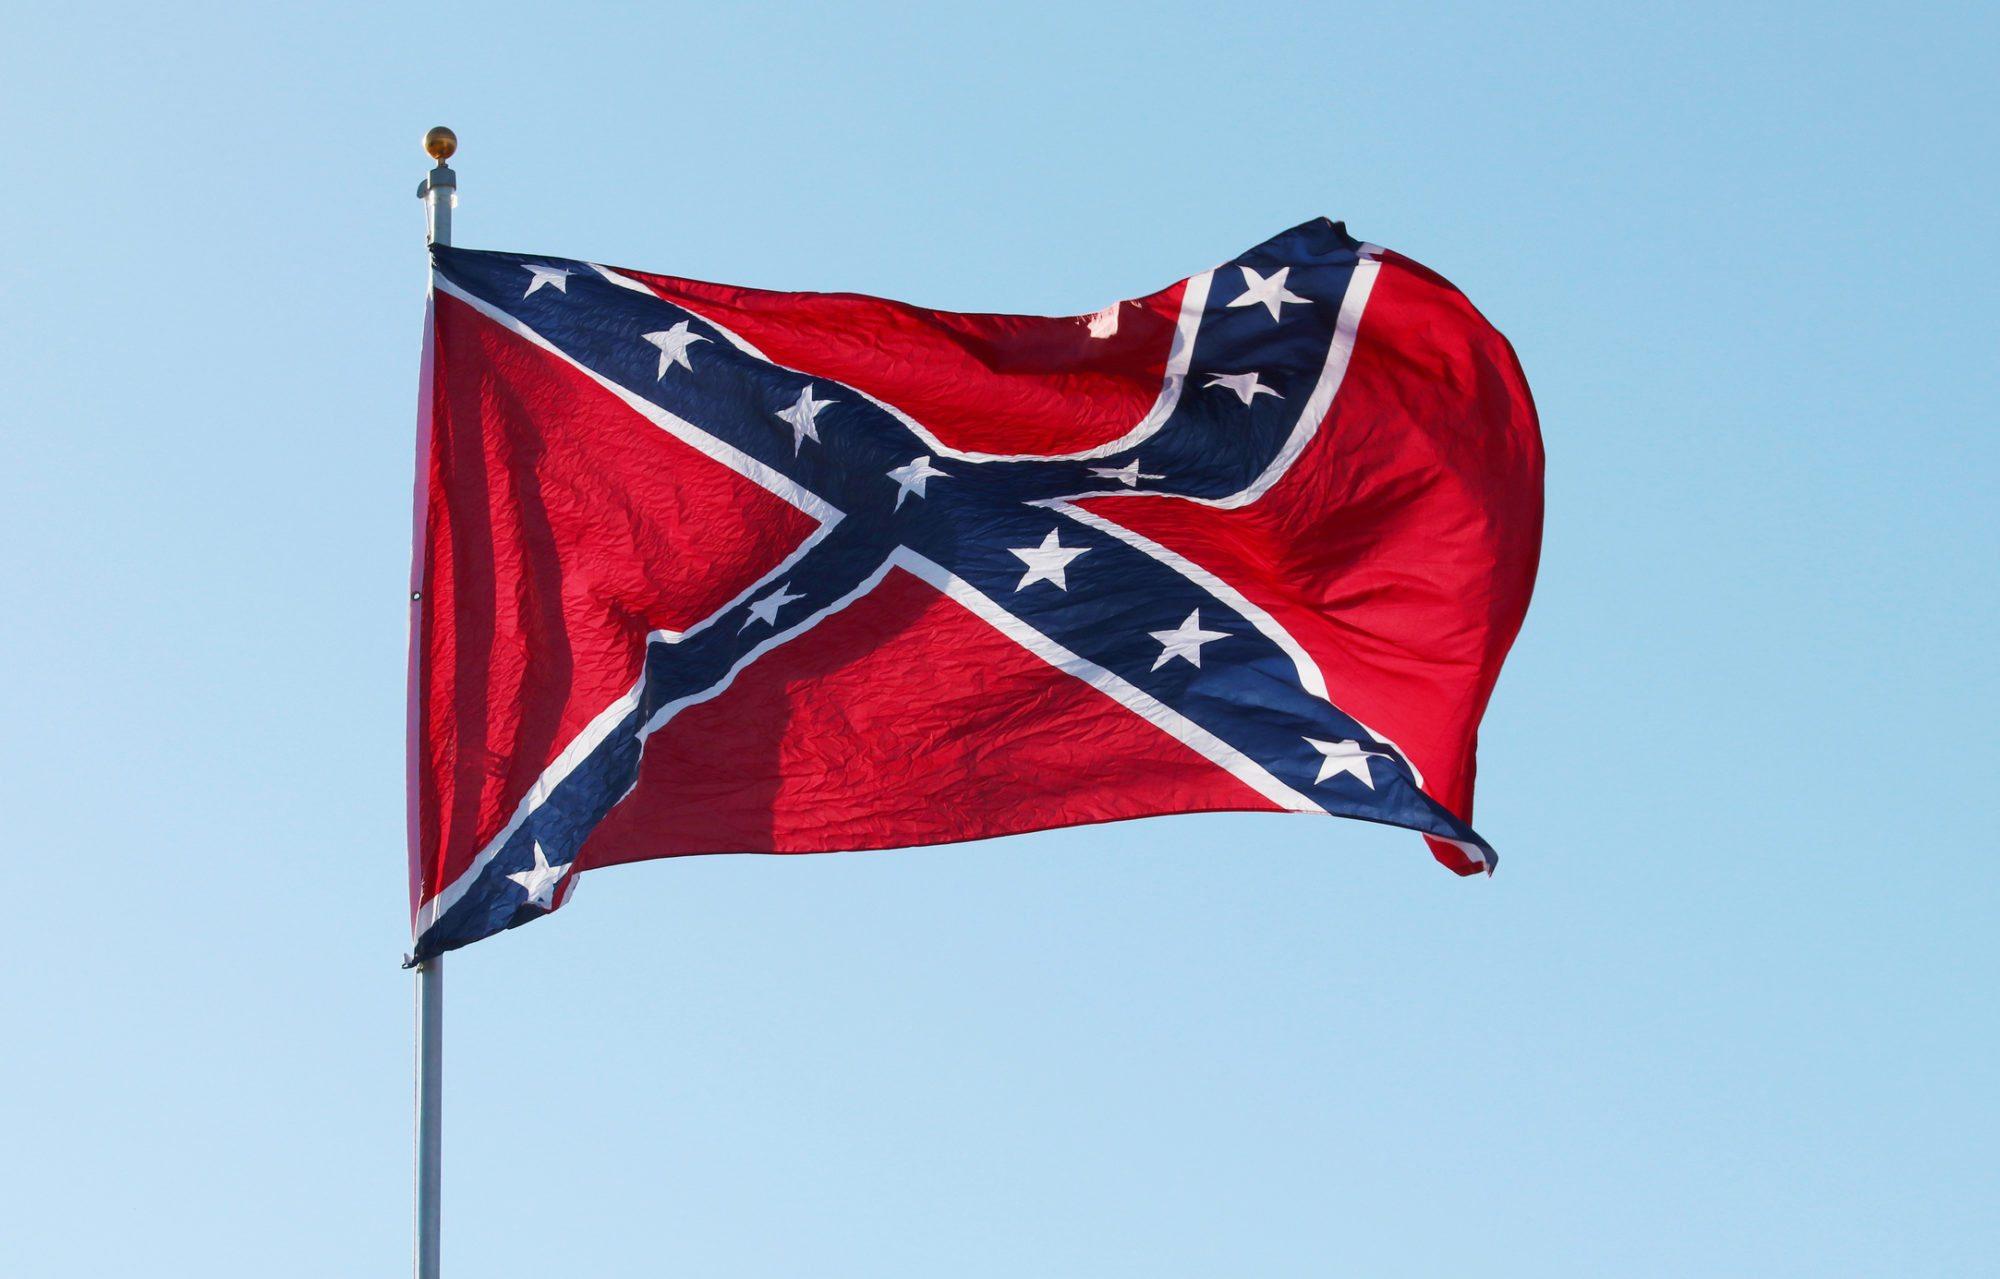 confederate flag in south carolina essay